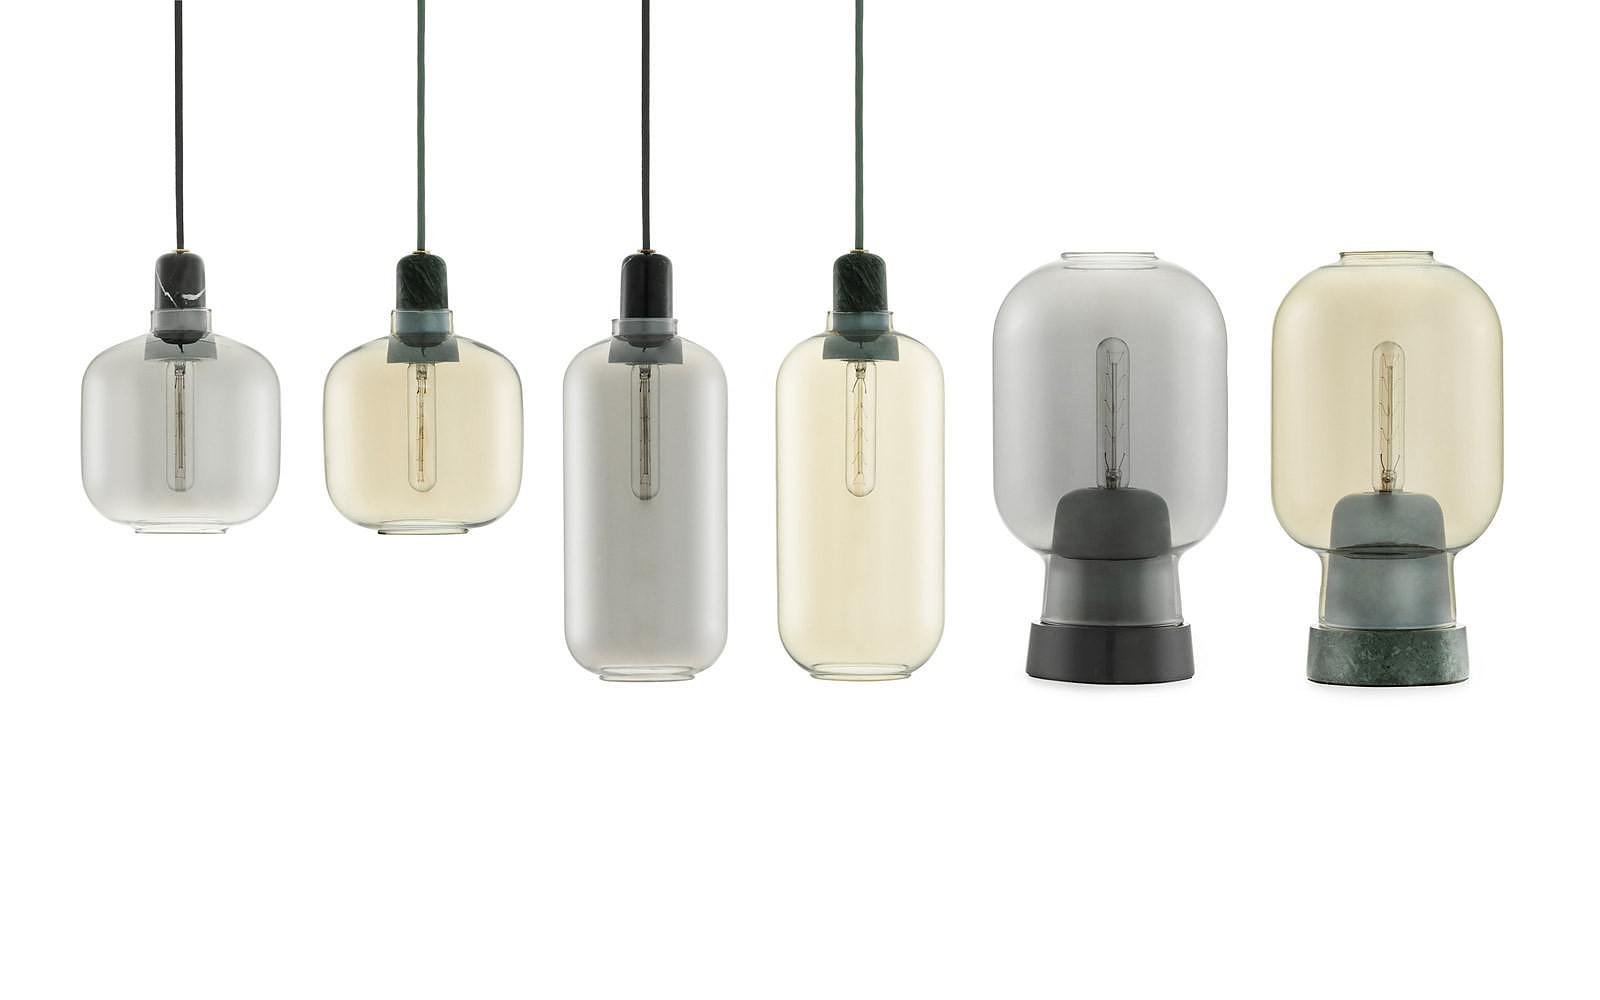 Amp Lamp by Simon Legald for Normann Copenhagen